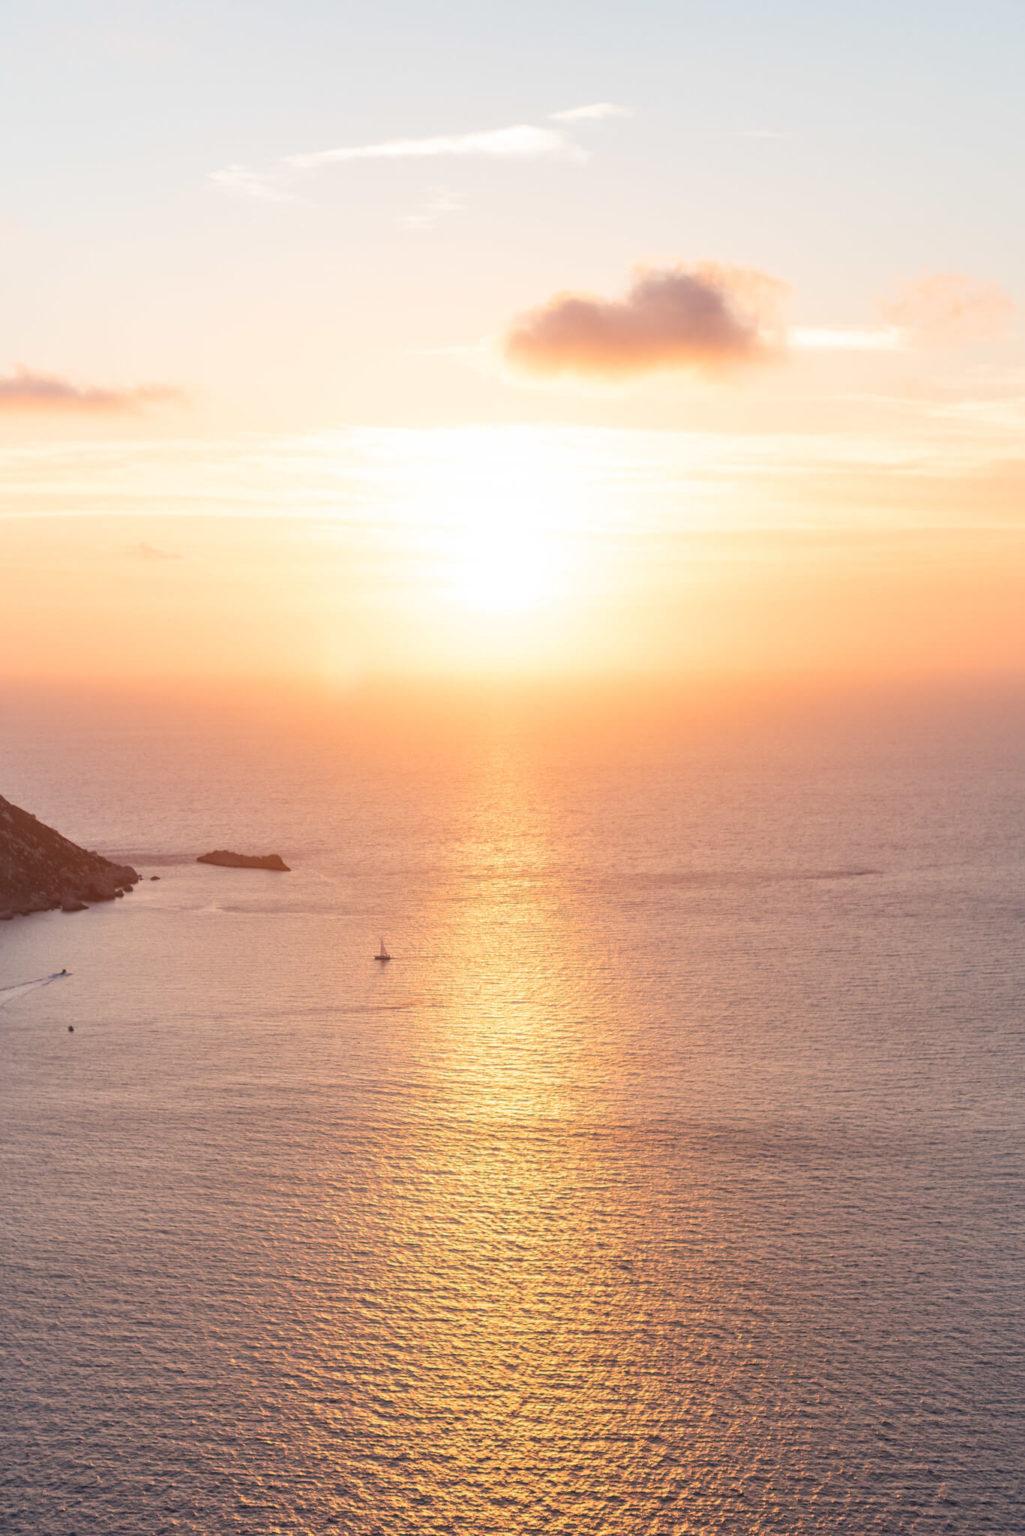 https://www.white-ibiza.com/wp-content/uploads/2020/03/ibiza-sunsets-es-vedra-2020-05-1025x1536.jpg